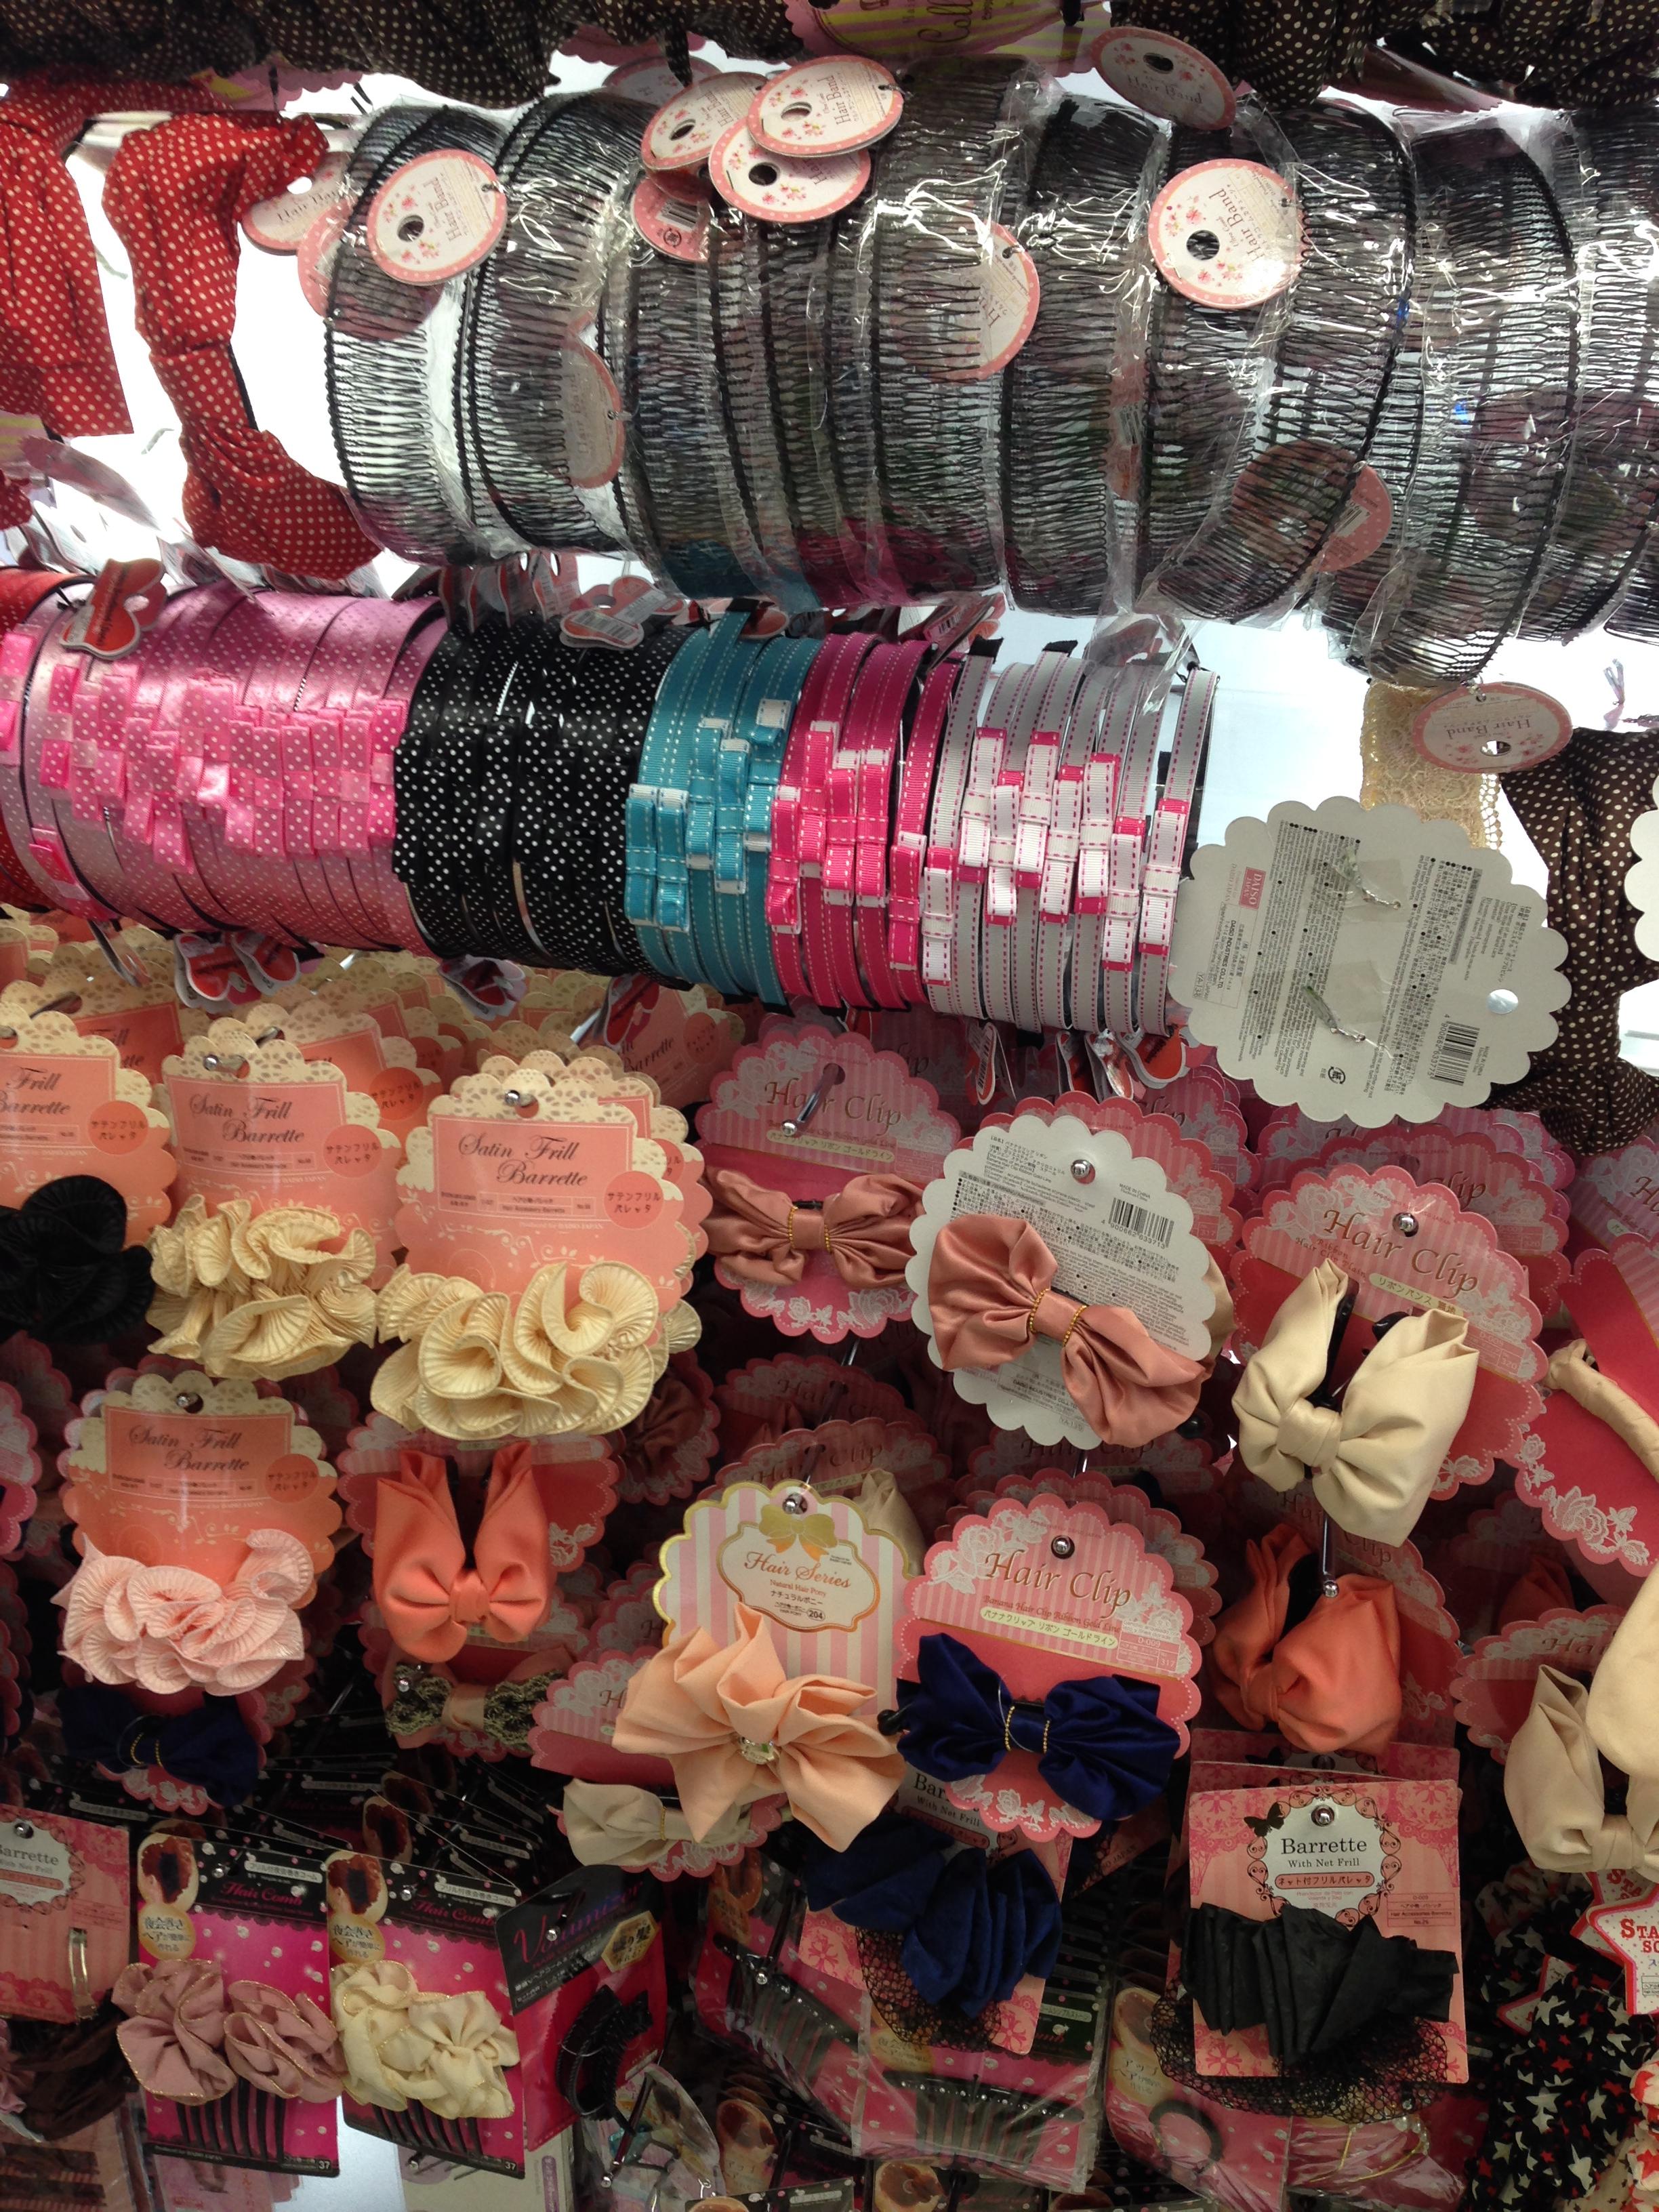 FOUND: Cressida Bonas' hair supply store.